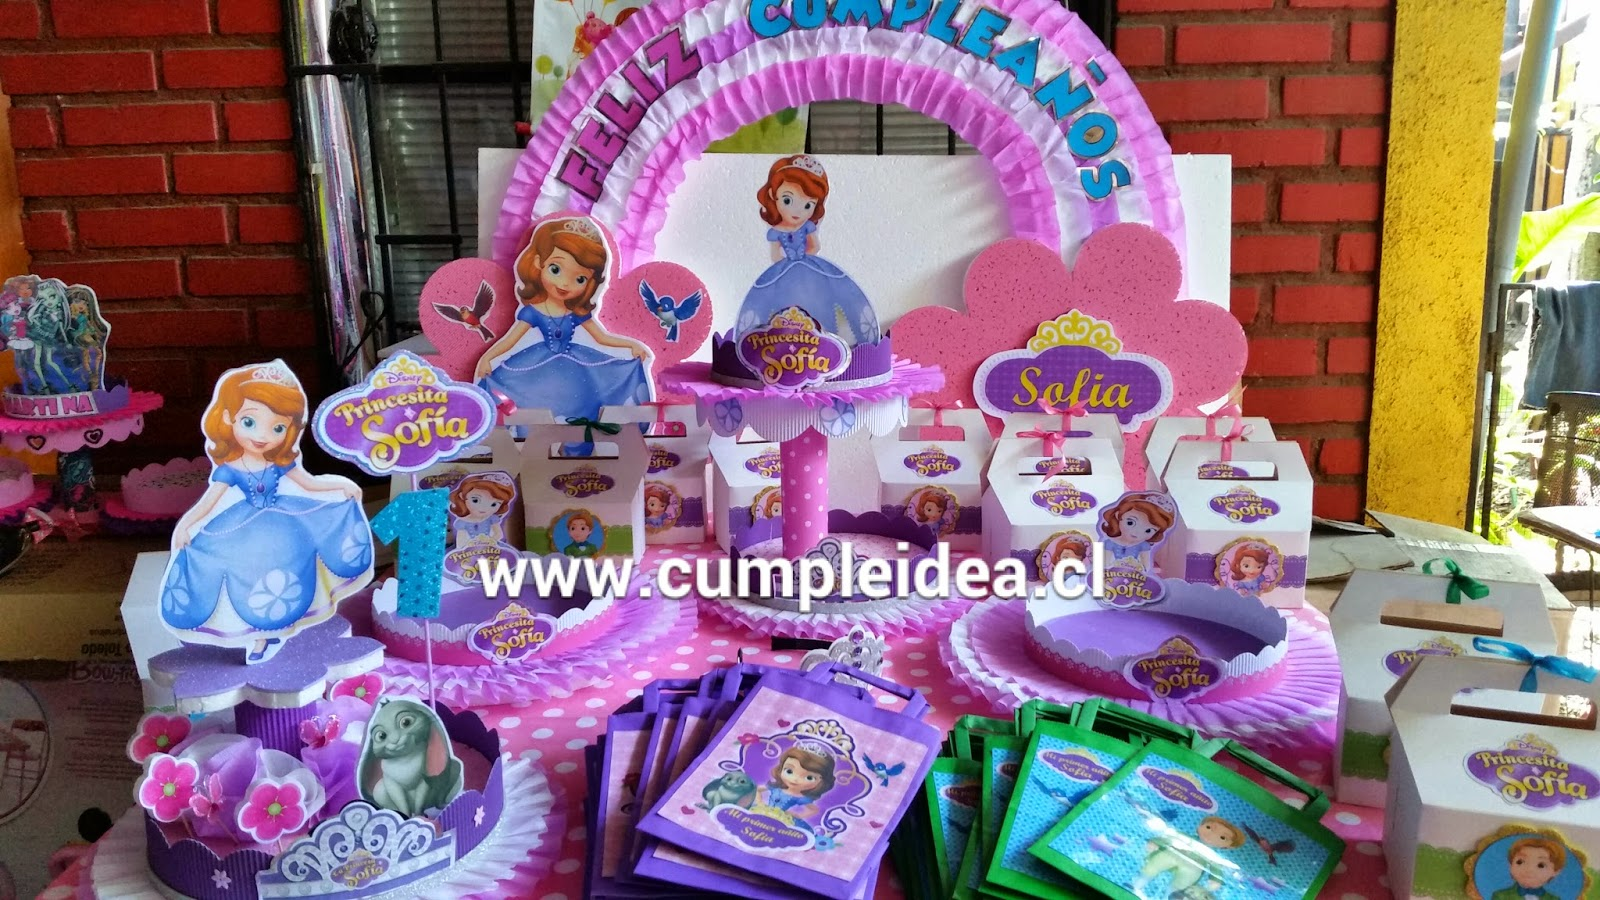 Decoraciones infantiles princesita sofia for Decoraciones infantiles